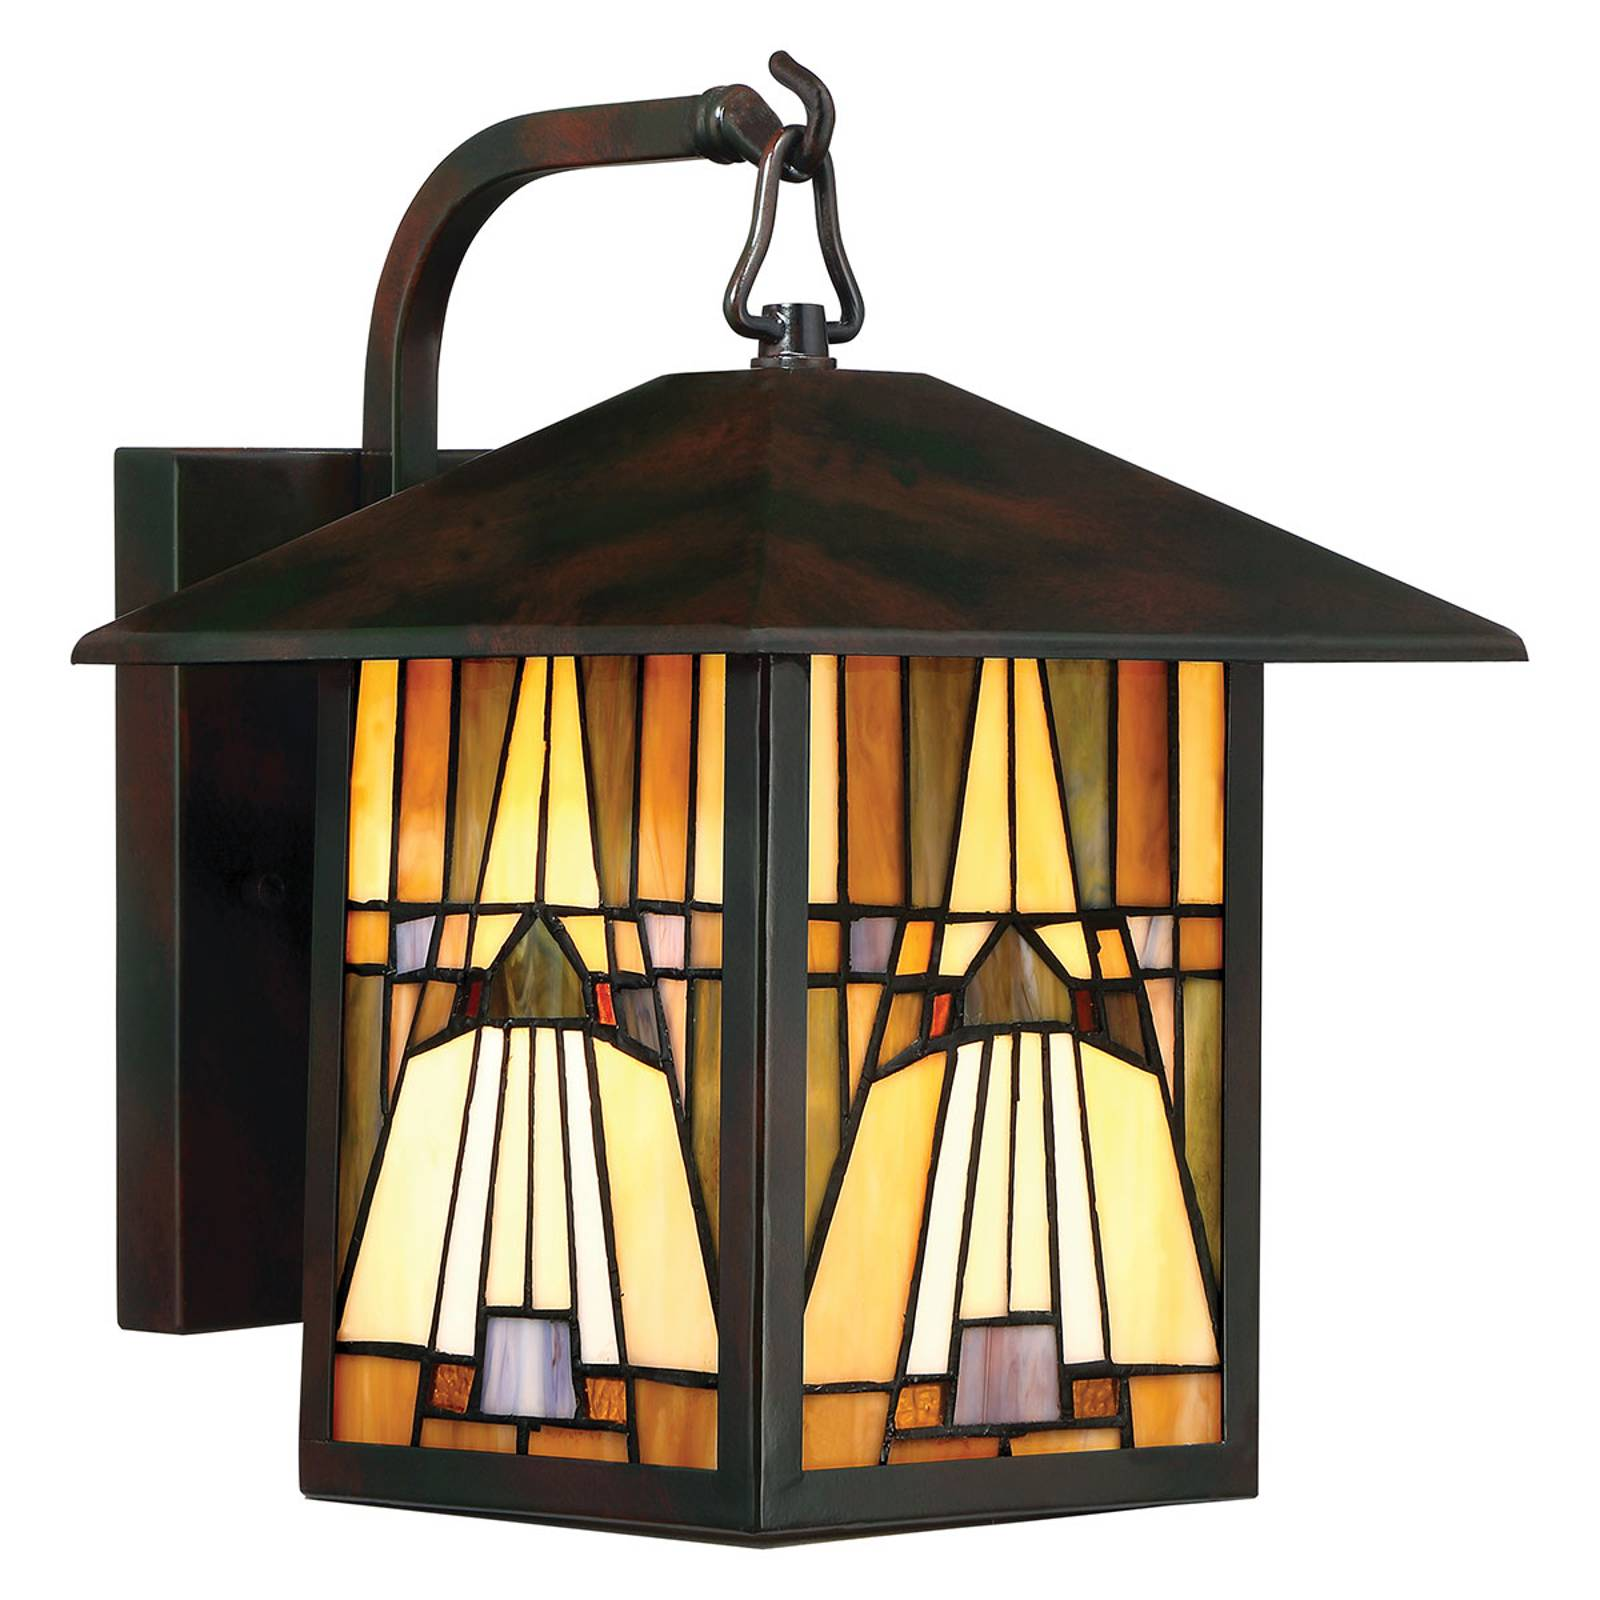 Buitenwandlamp Inglenook, bont glas, H 31,4 cm